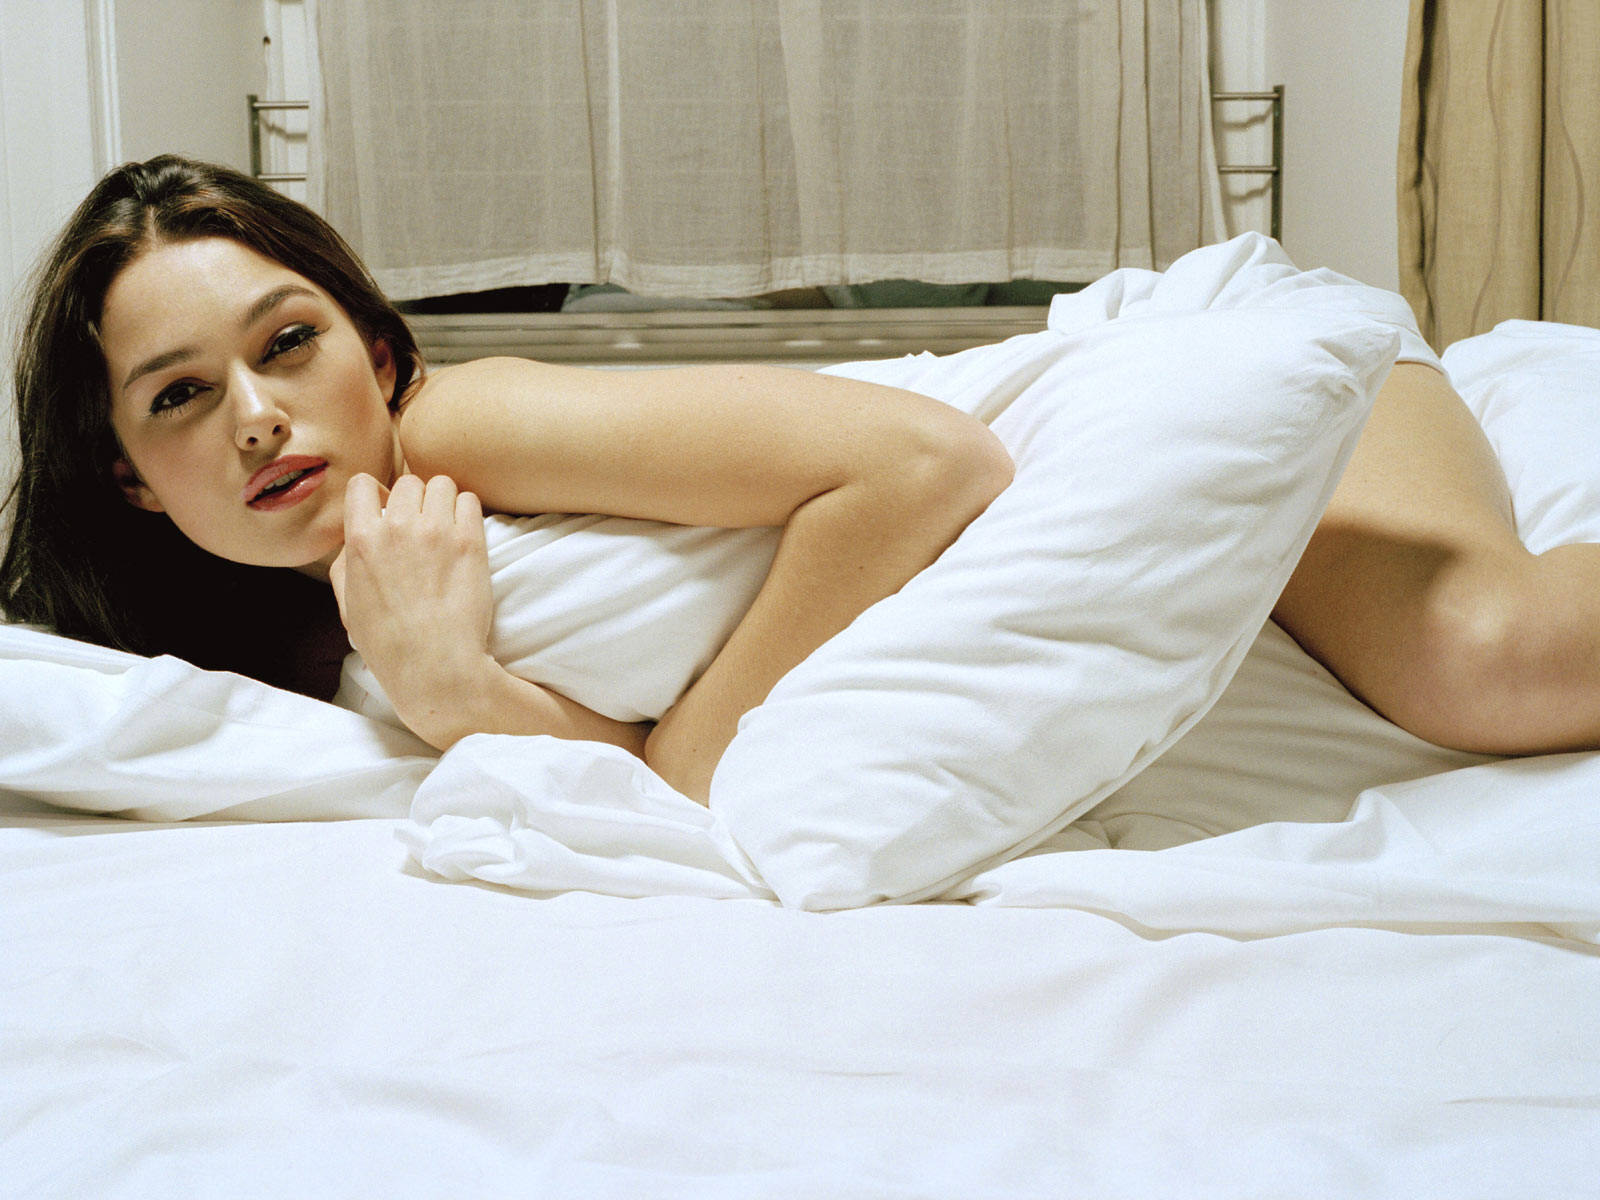 http://2.bp.blogspot.com/-WH9AcQS3a4g/TjON8RPHedI/AAAAAAAAEY0/CbeVqSbVsGQ/s1600/Keira-Knightley-Sexy-Hot-hd.jpg